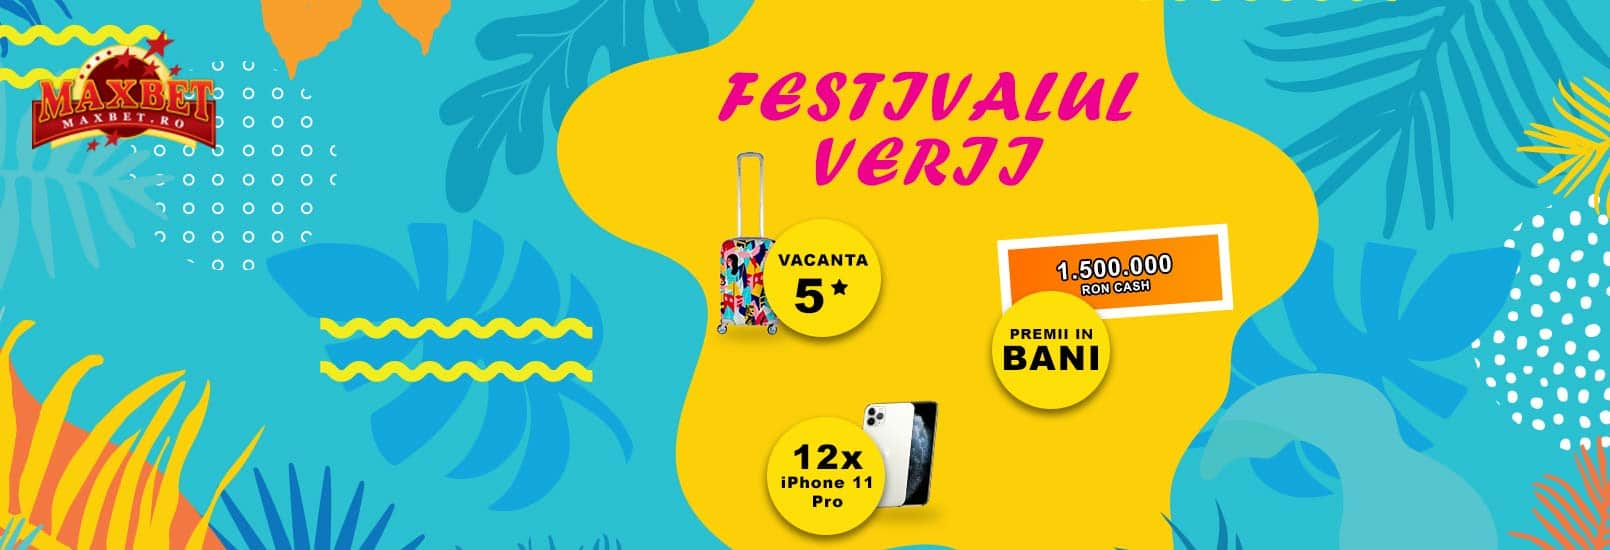 festivalul verii maxbet